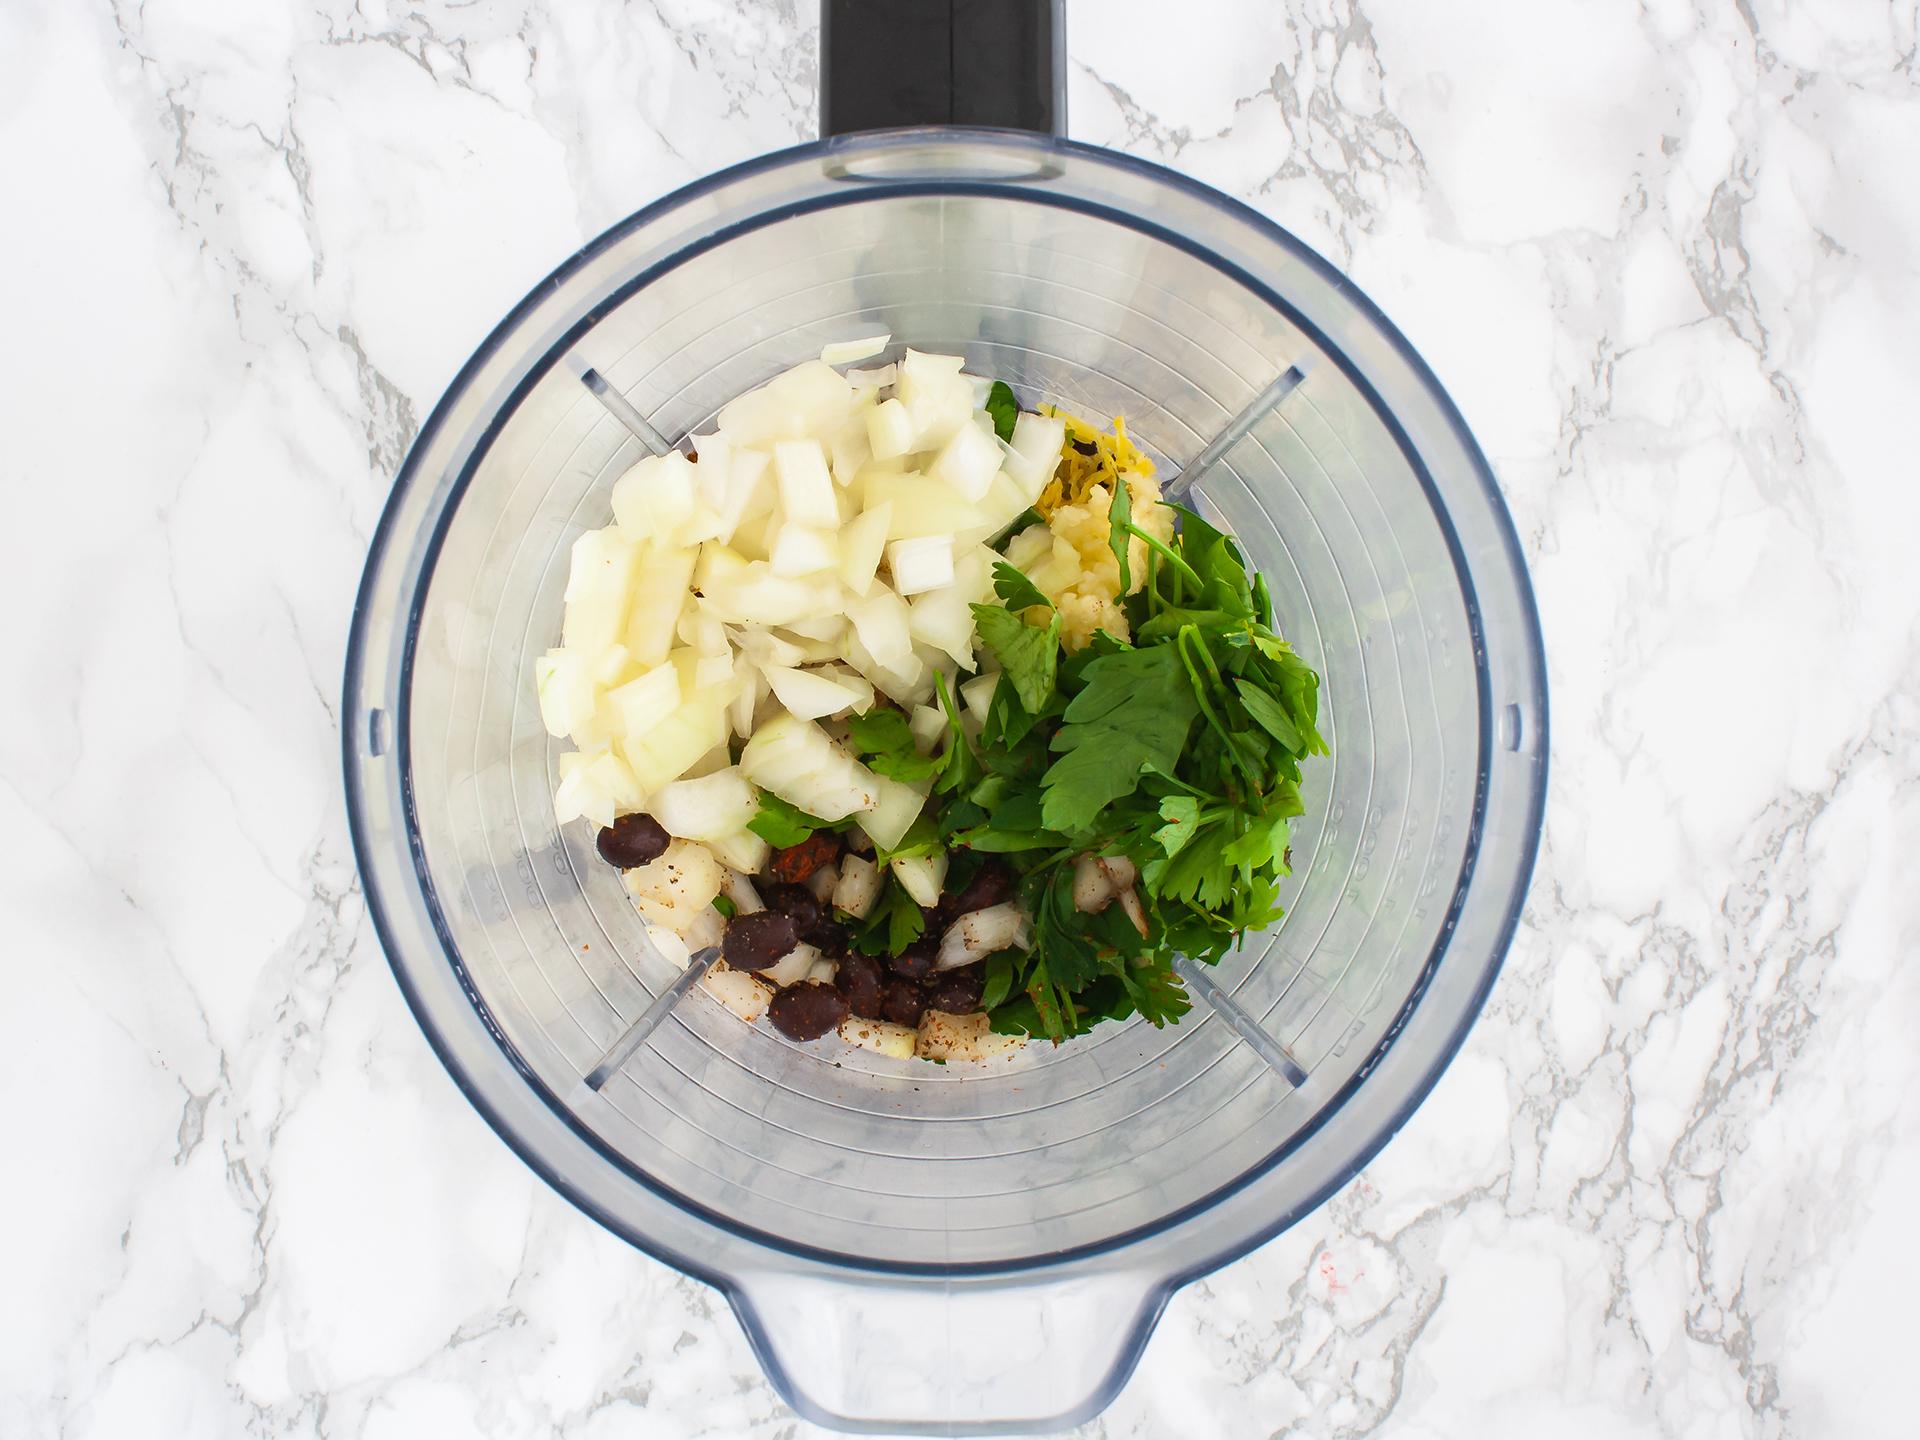 Step 3.1 of Baked Black Bean and Sweet Potato Falafels